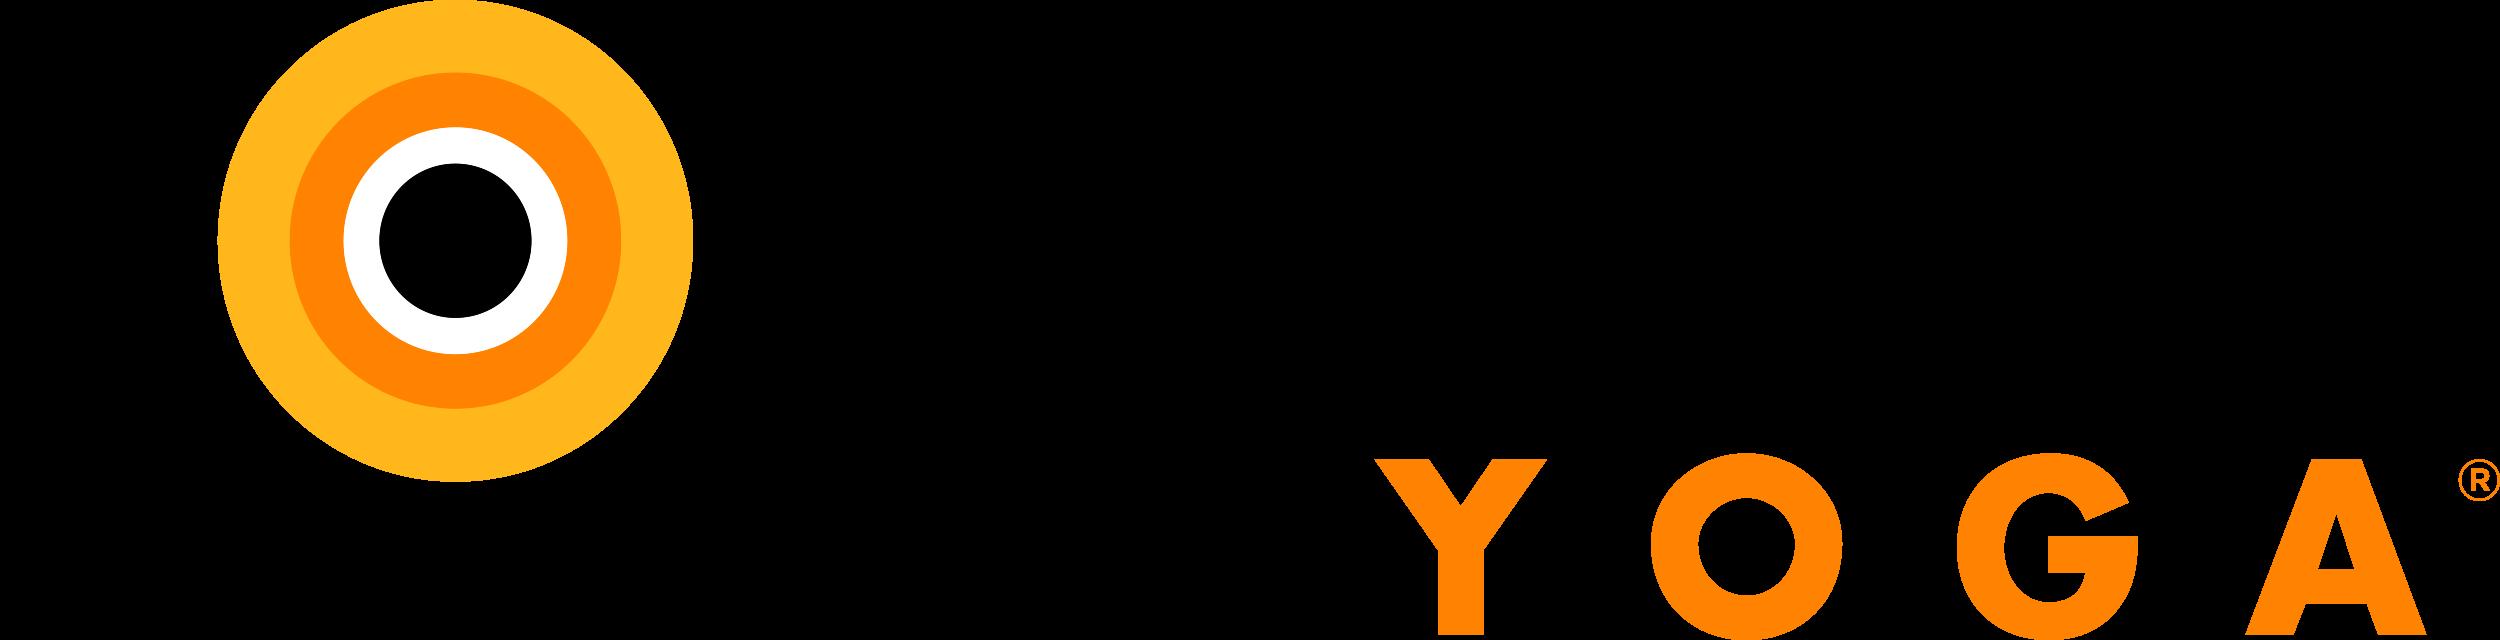 logo20171127-15290-12x1dt1.png